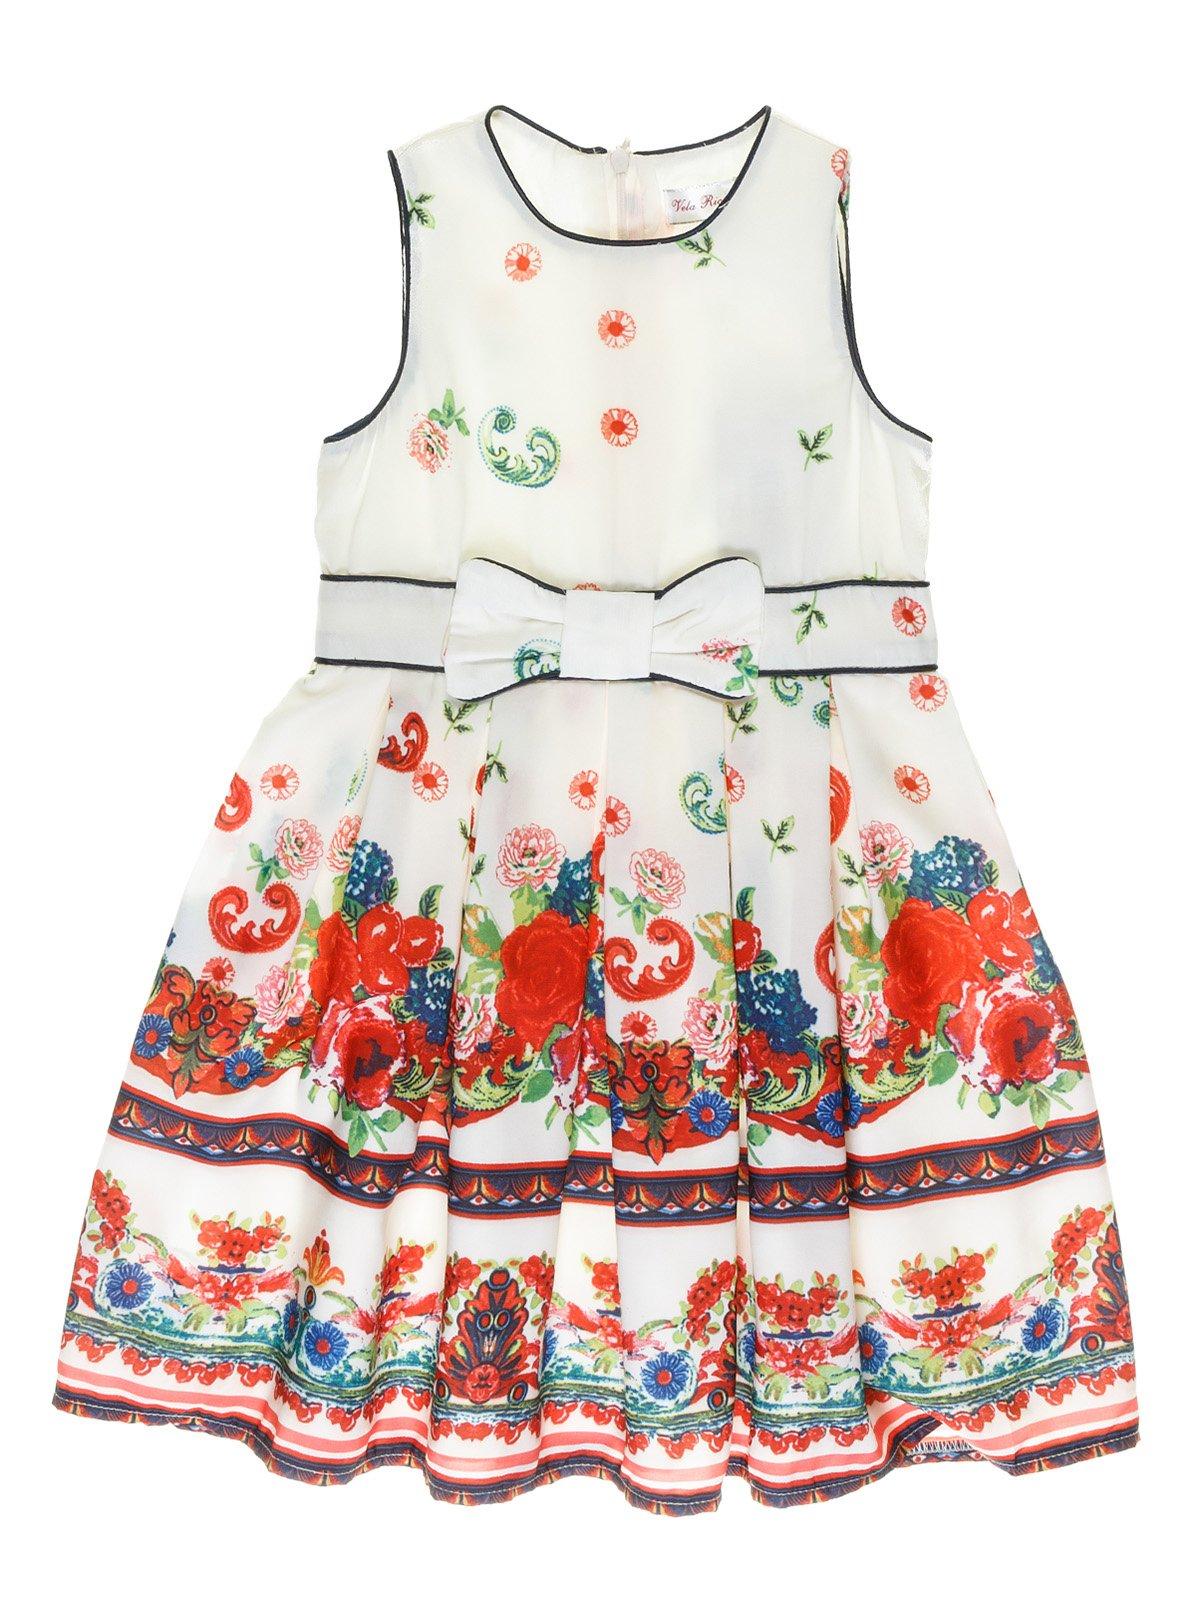 Платье молочного цвета с ярким рисунком | 973716